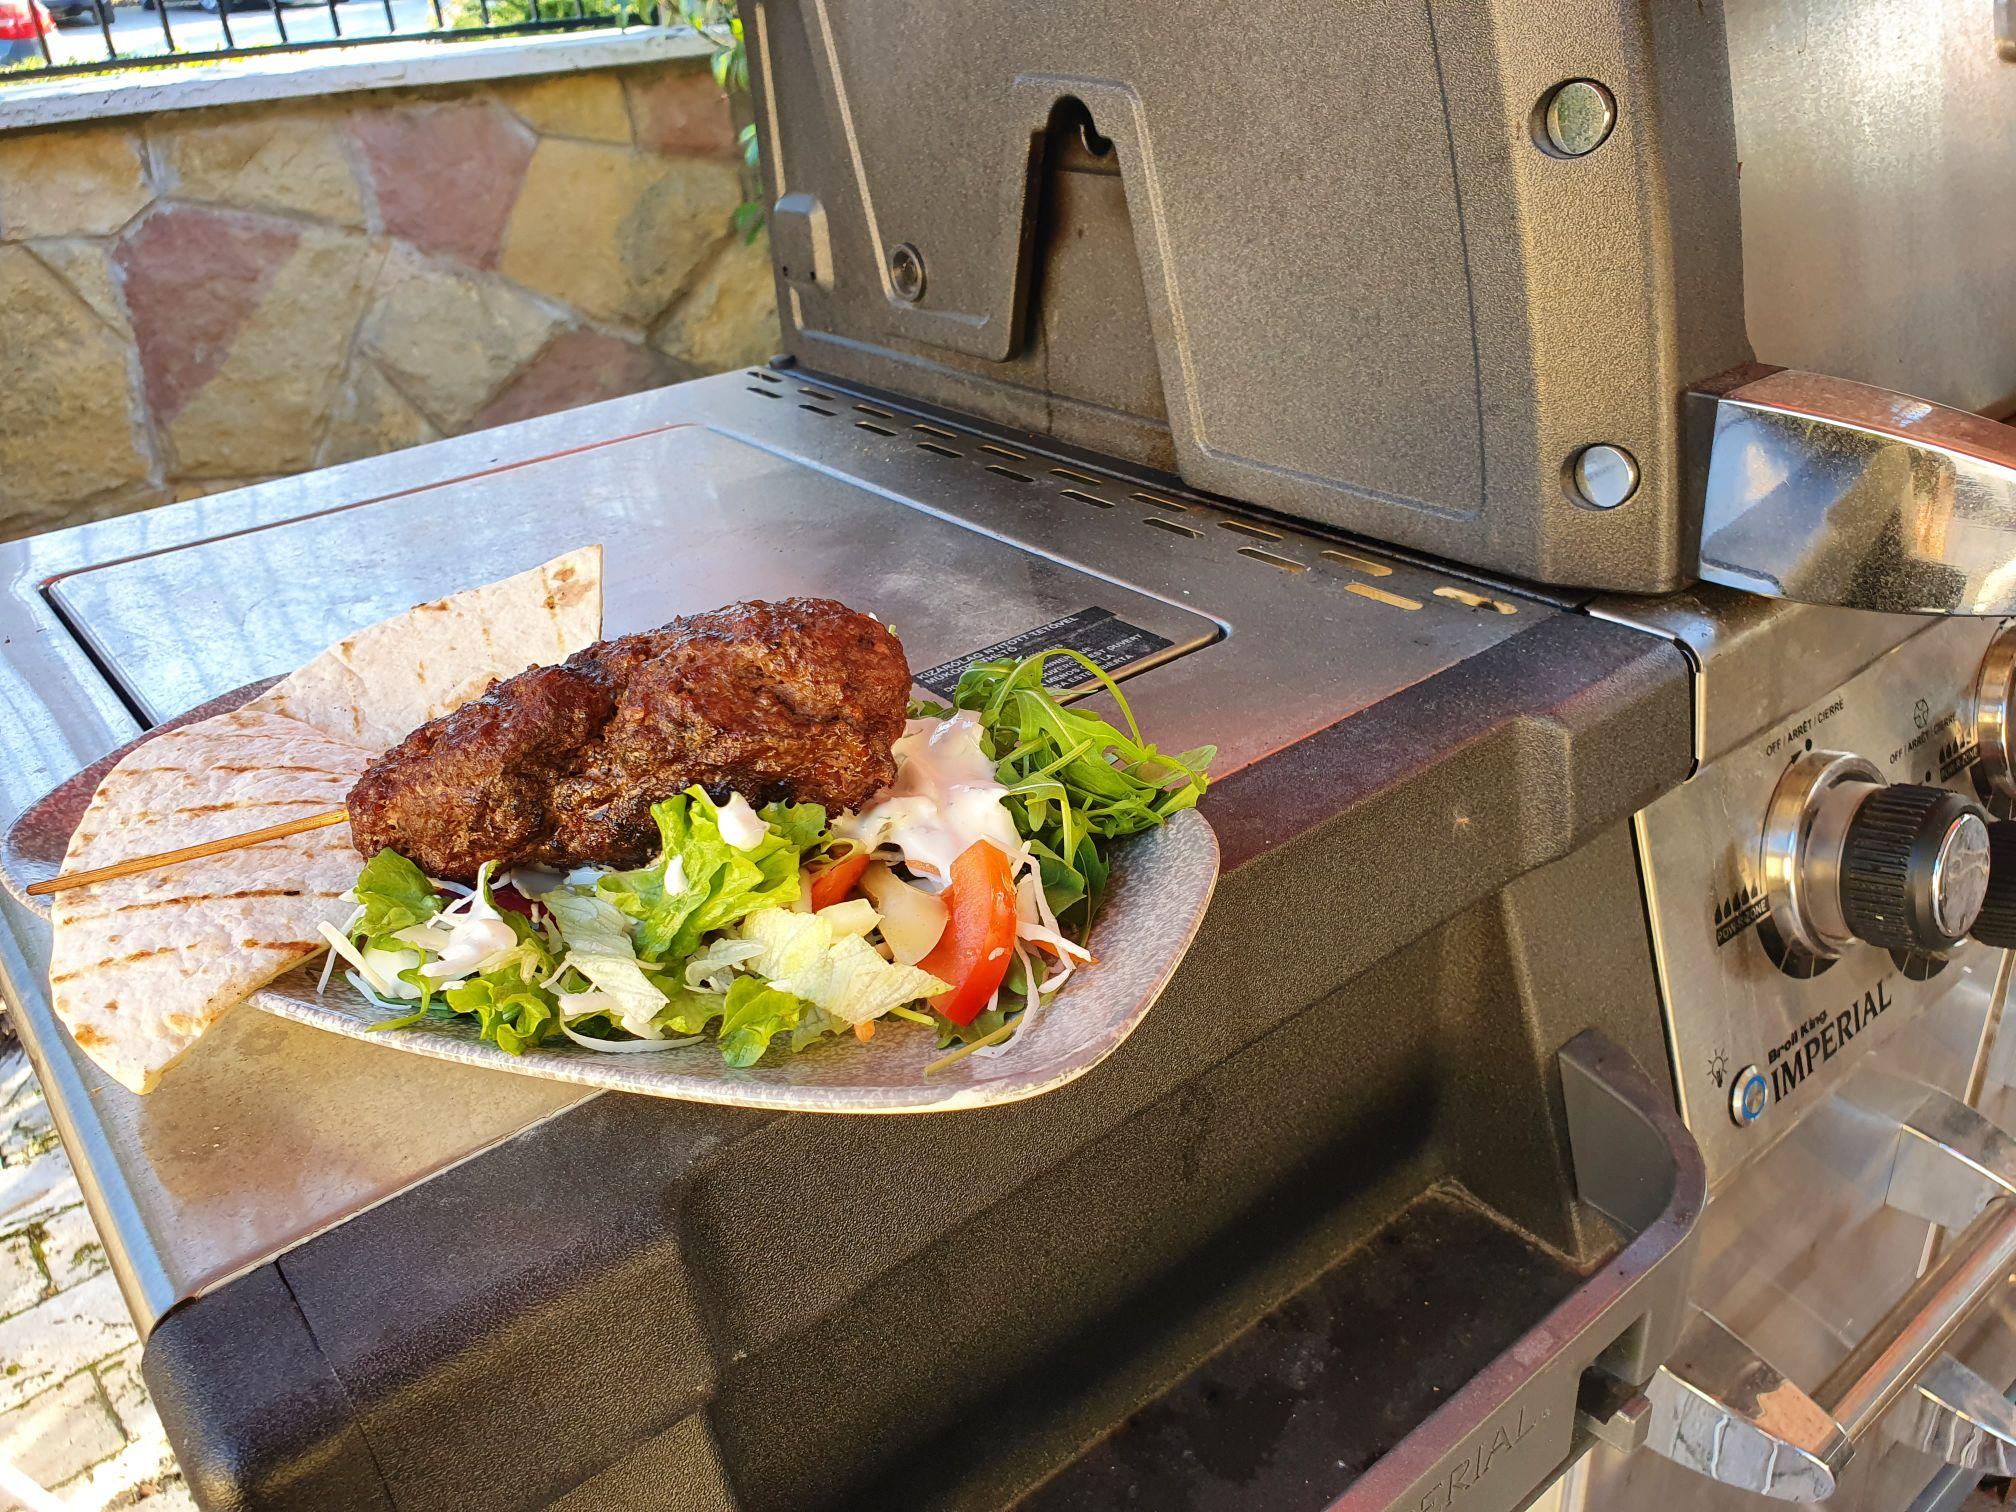 Marha kebab kevert salátával Broil King Imperial gázgrillen